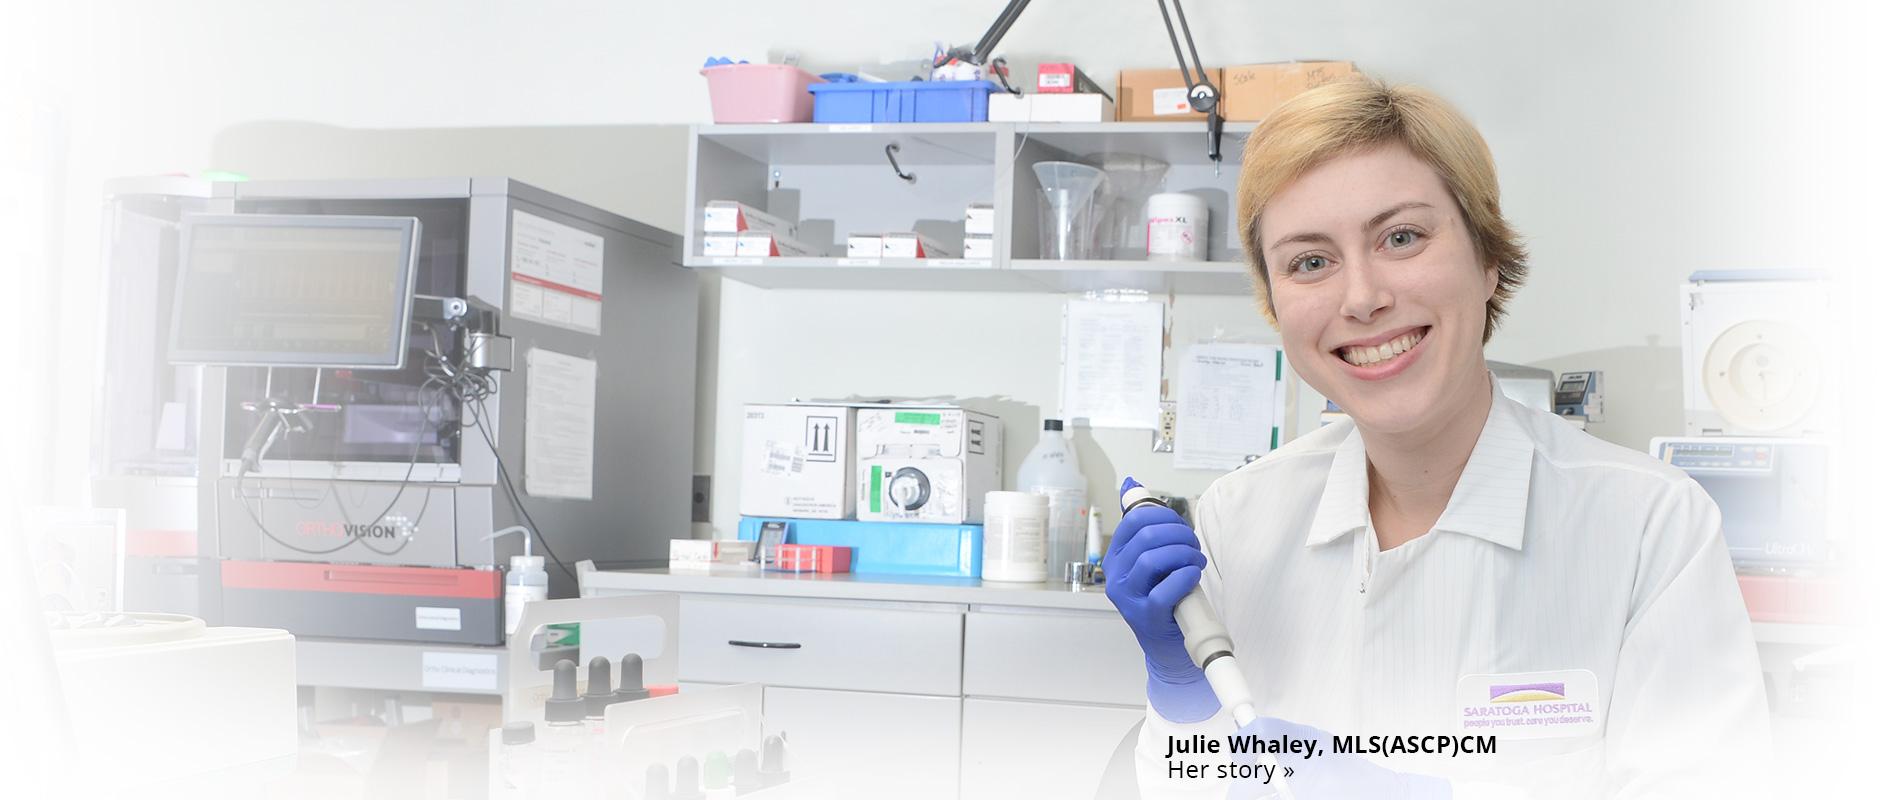 Julie Whaley lab room